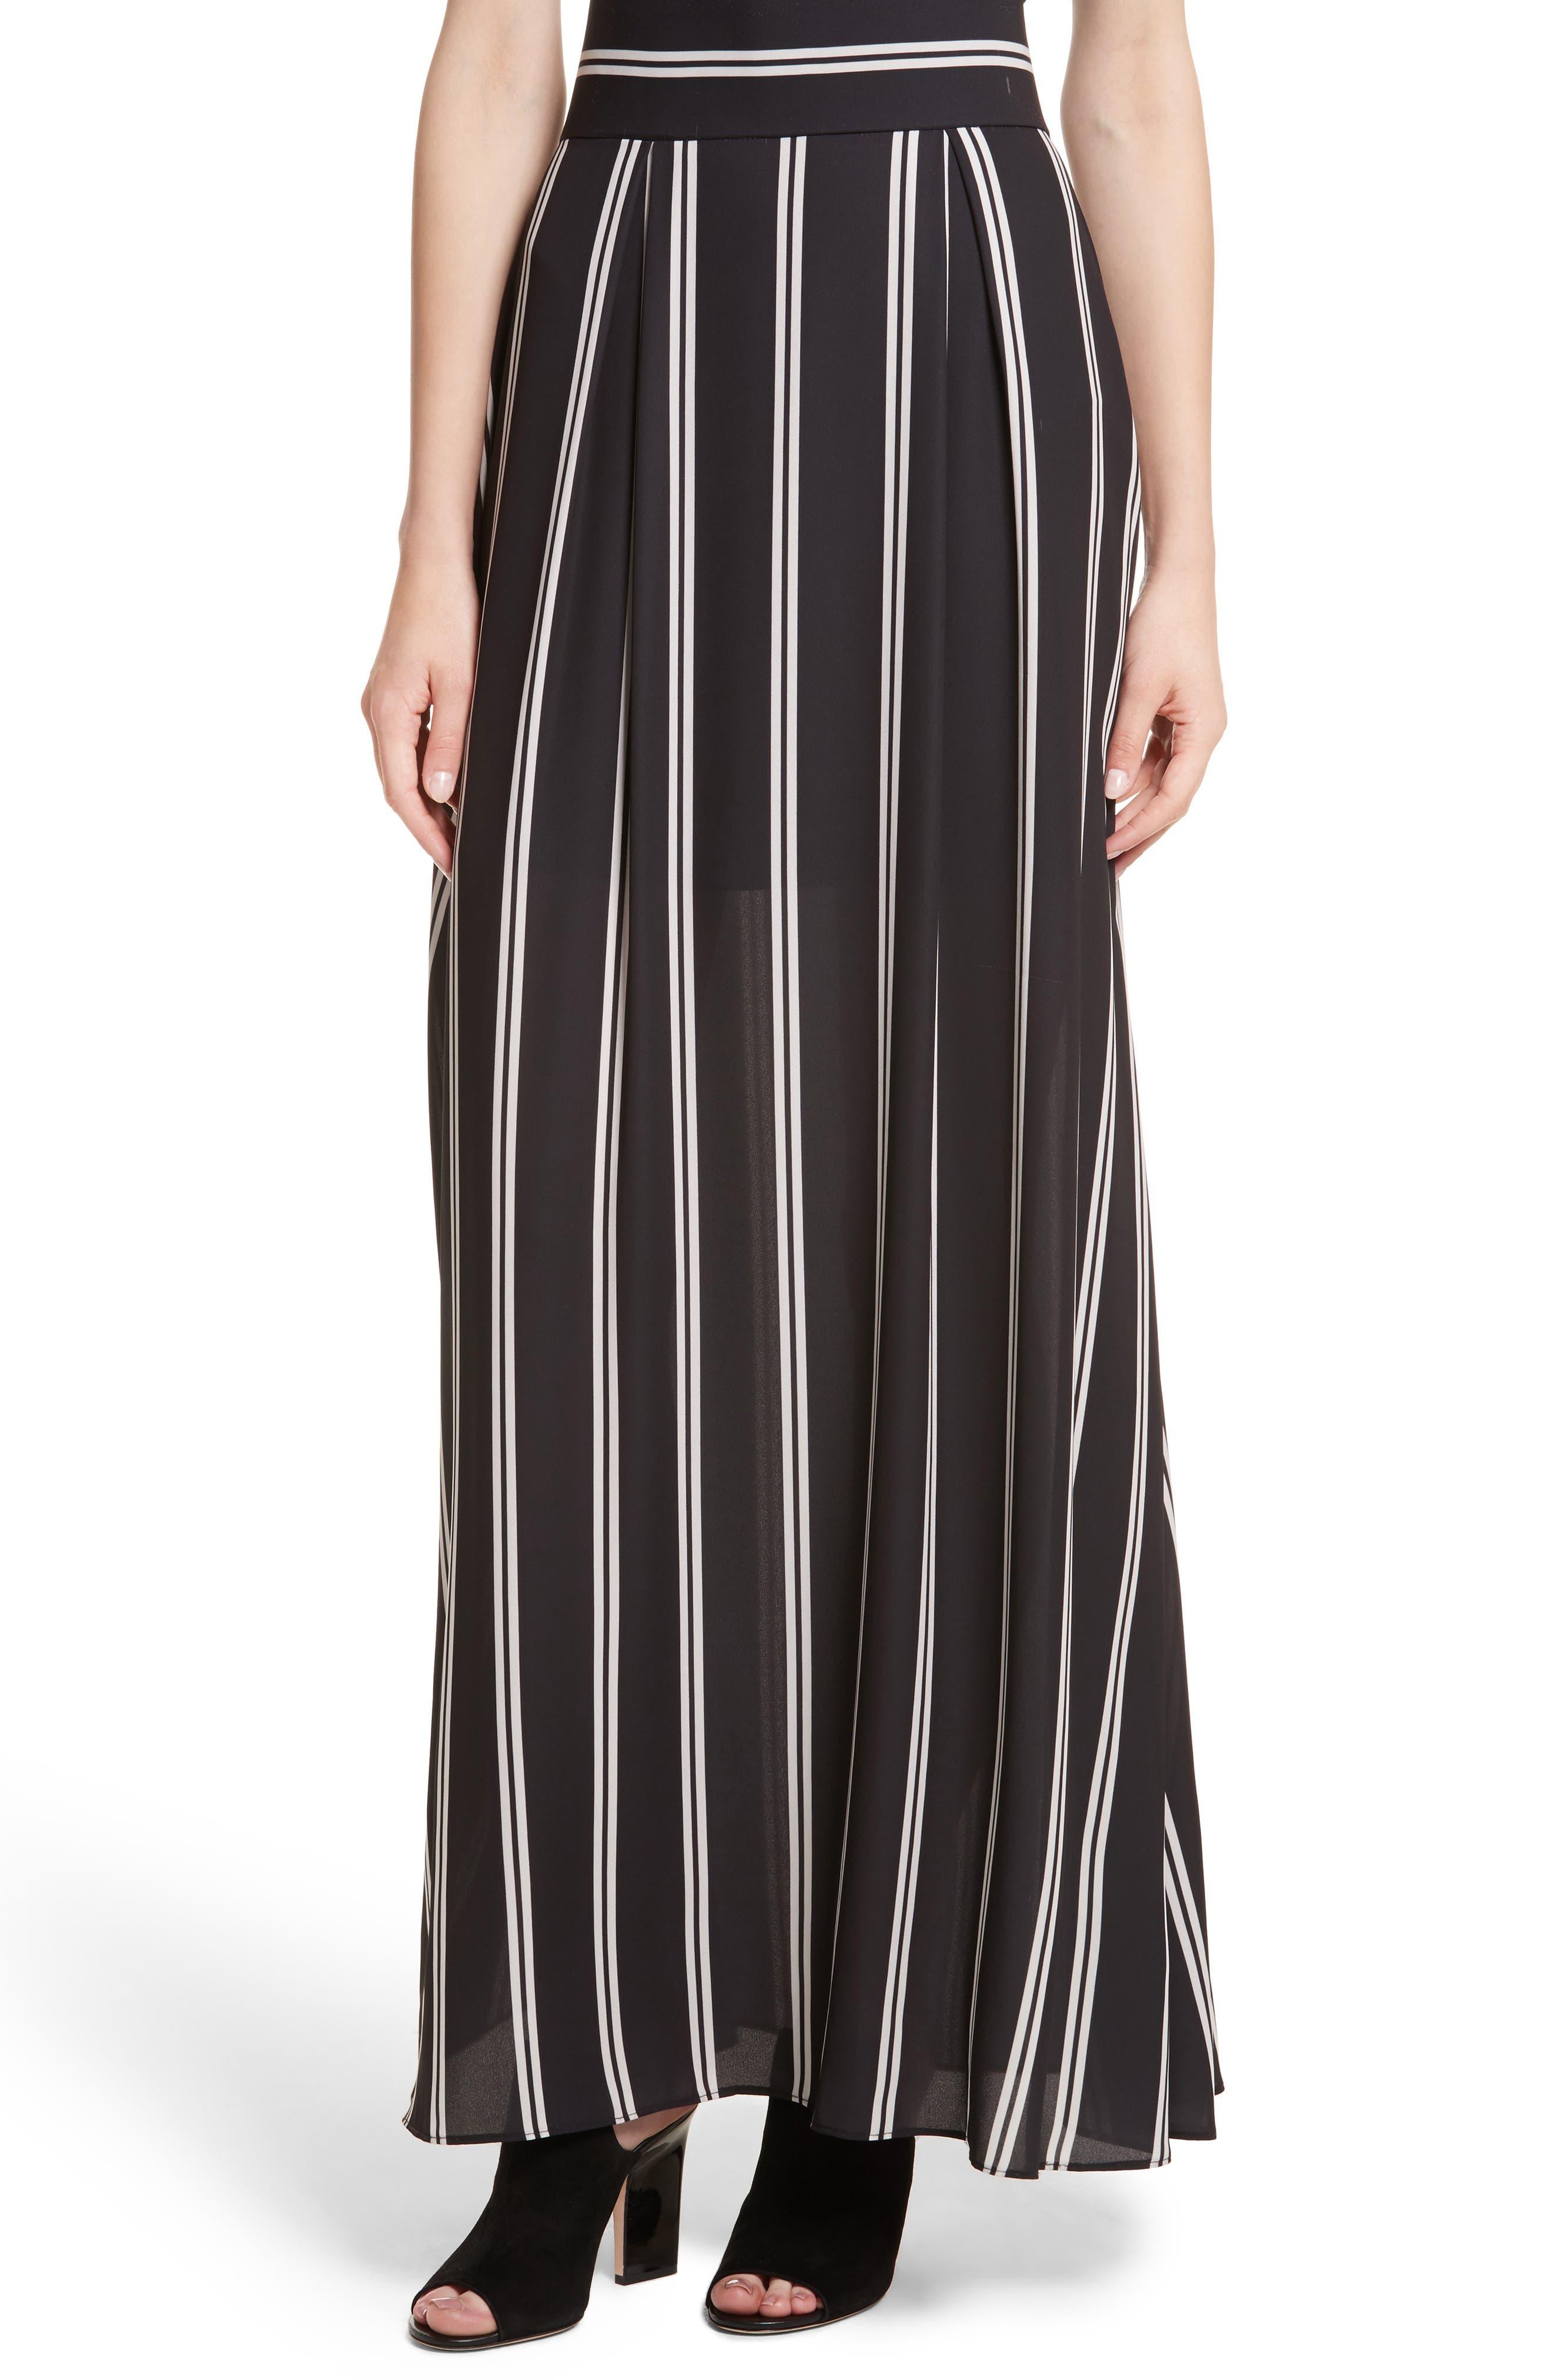 Gabel Clean Pleat Maxi Skirt,                             Main thumbnail 1, color,                             002